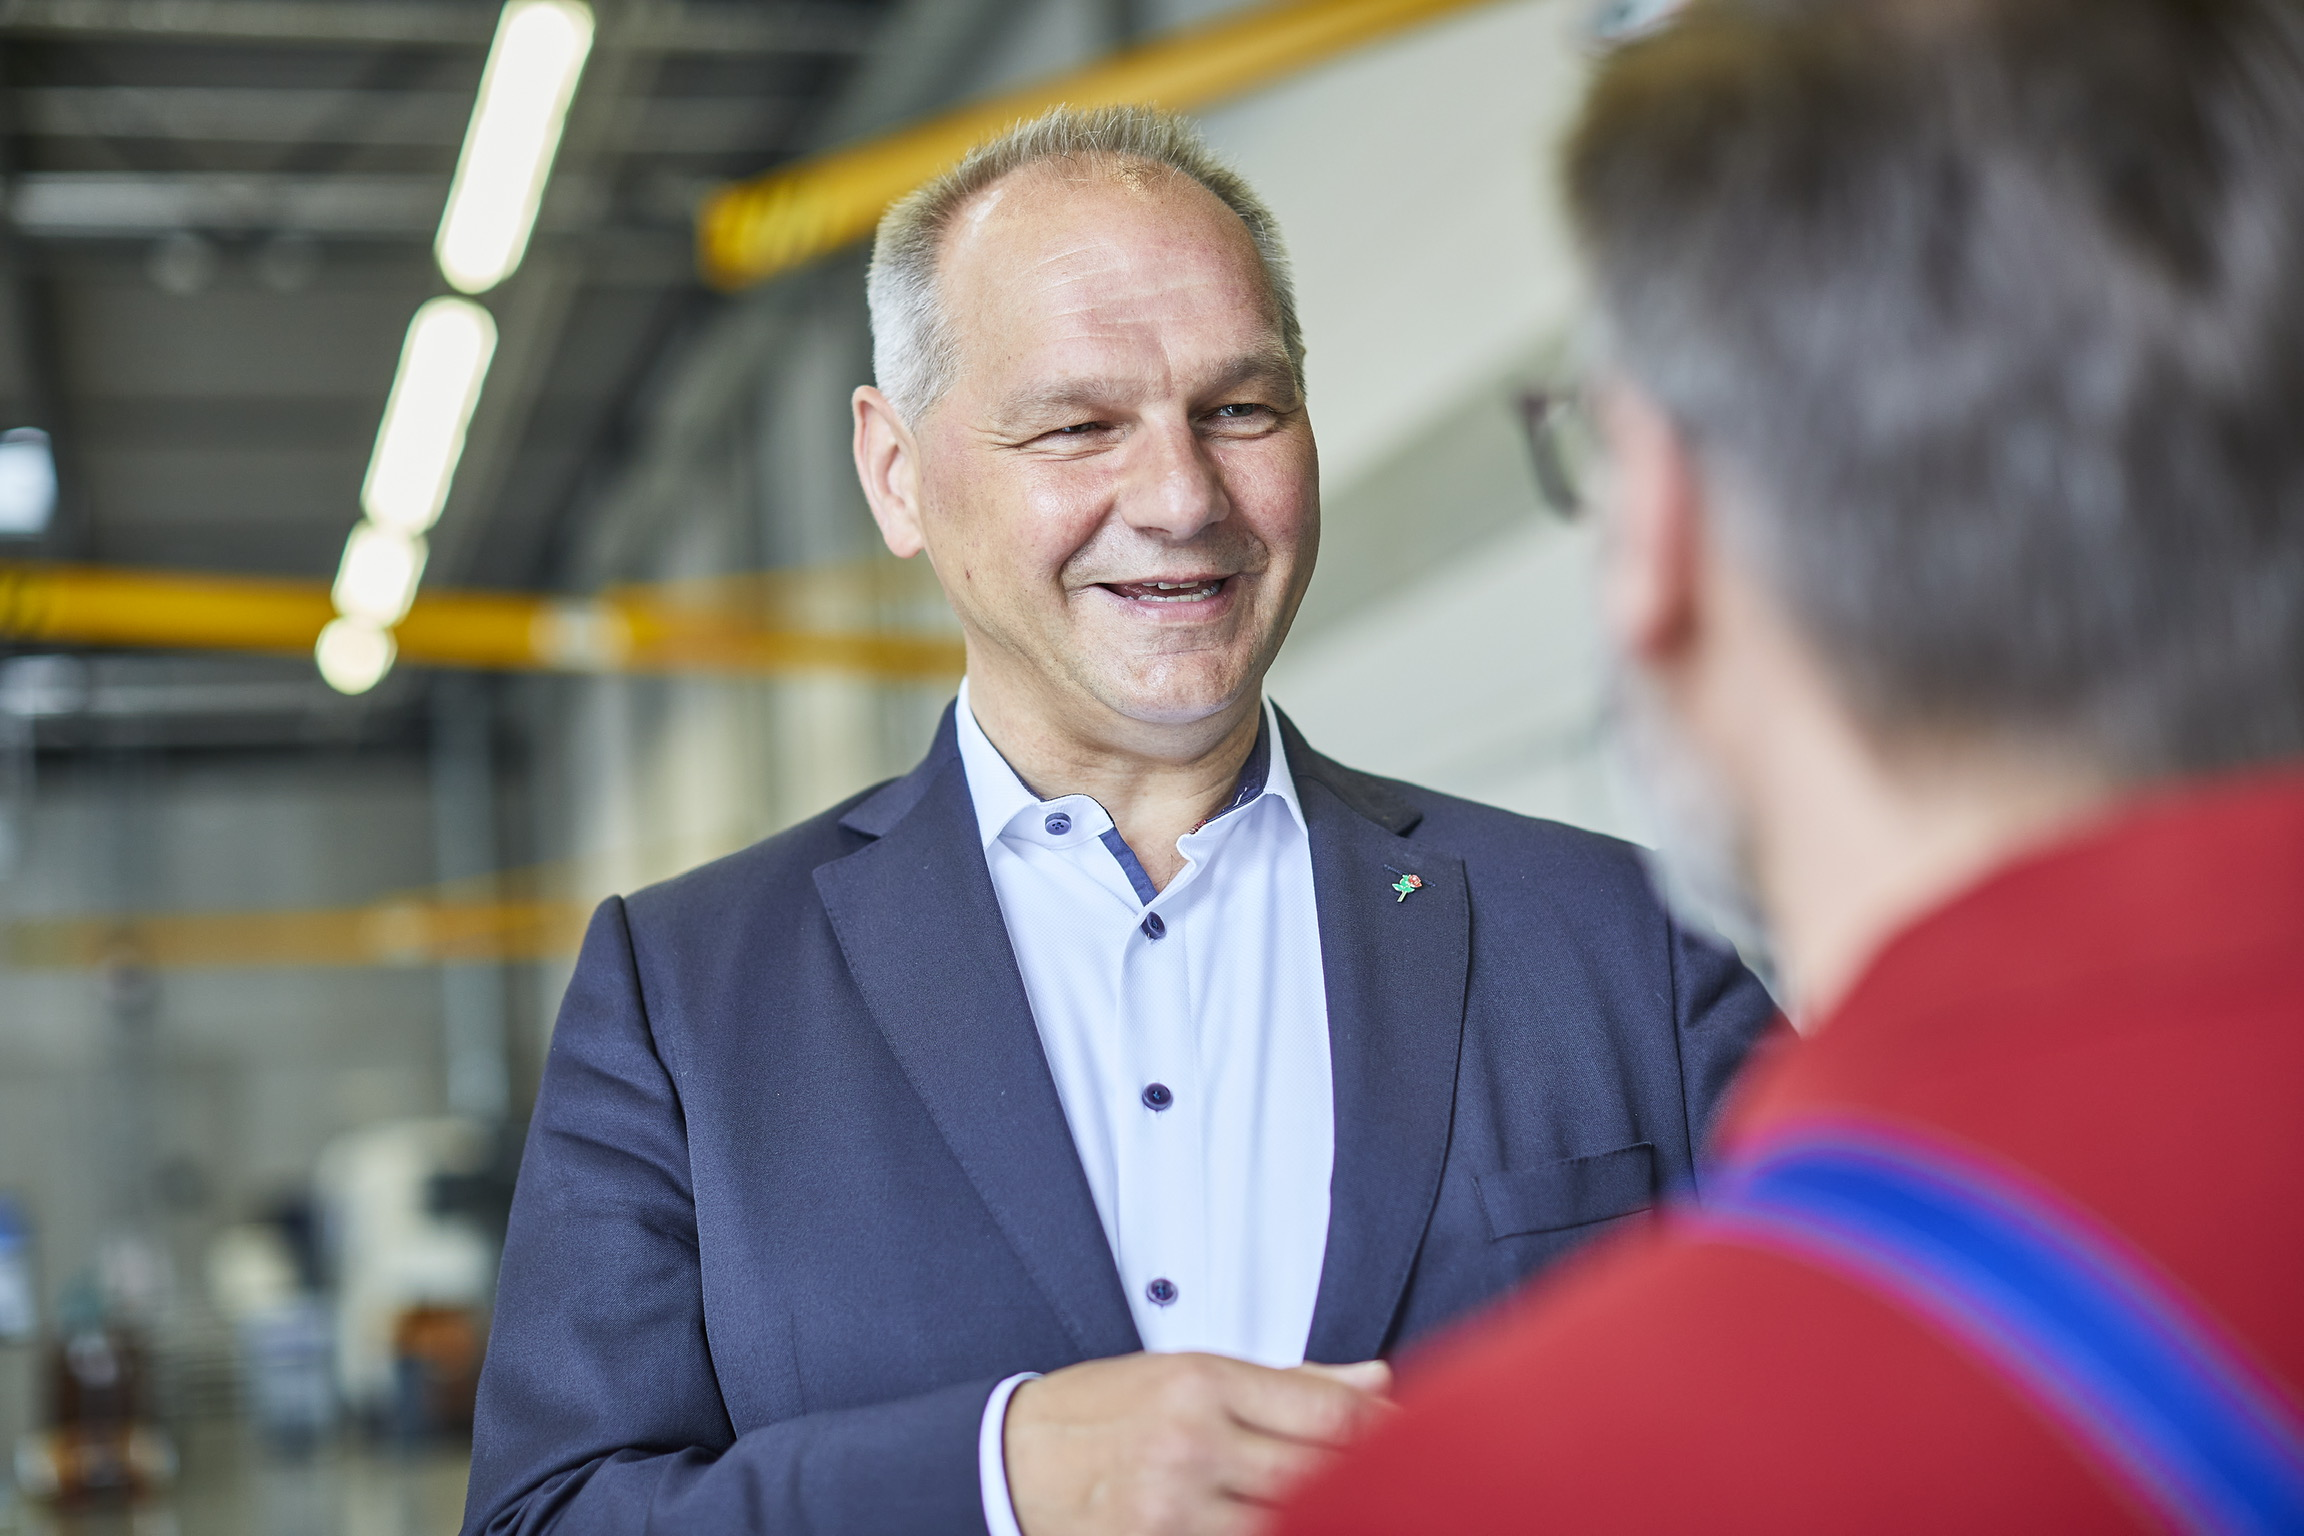 Mathias Stein in Werkshalle, Foto Olaf Bathke